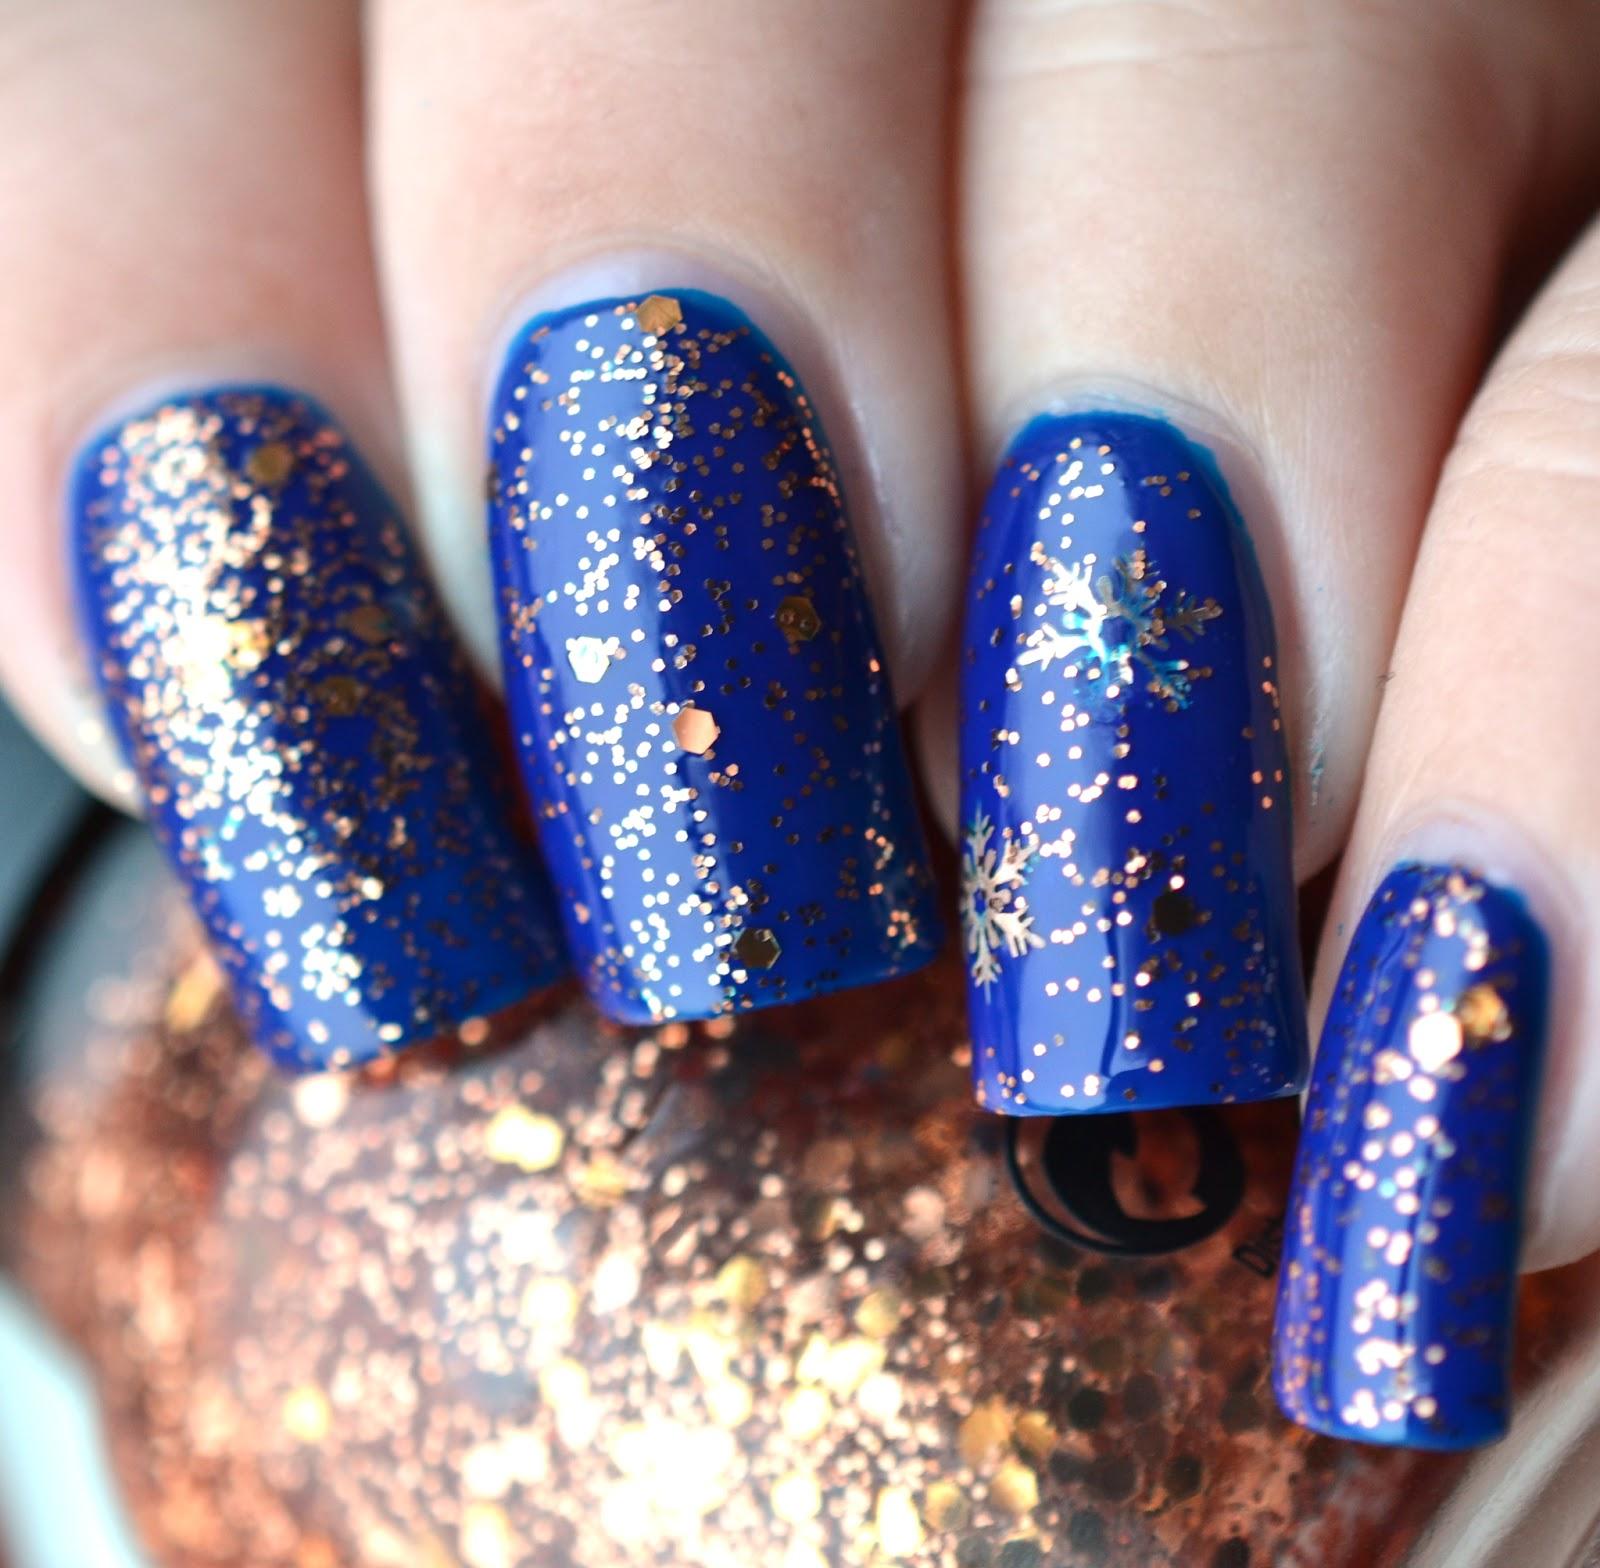 http://lenas-sofa.blogspot.de/2014/11/kiko-nail-lacquer-335-ink-blue.html